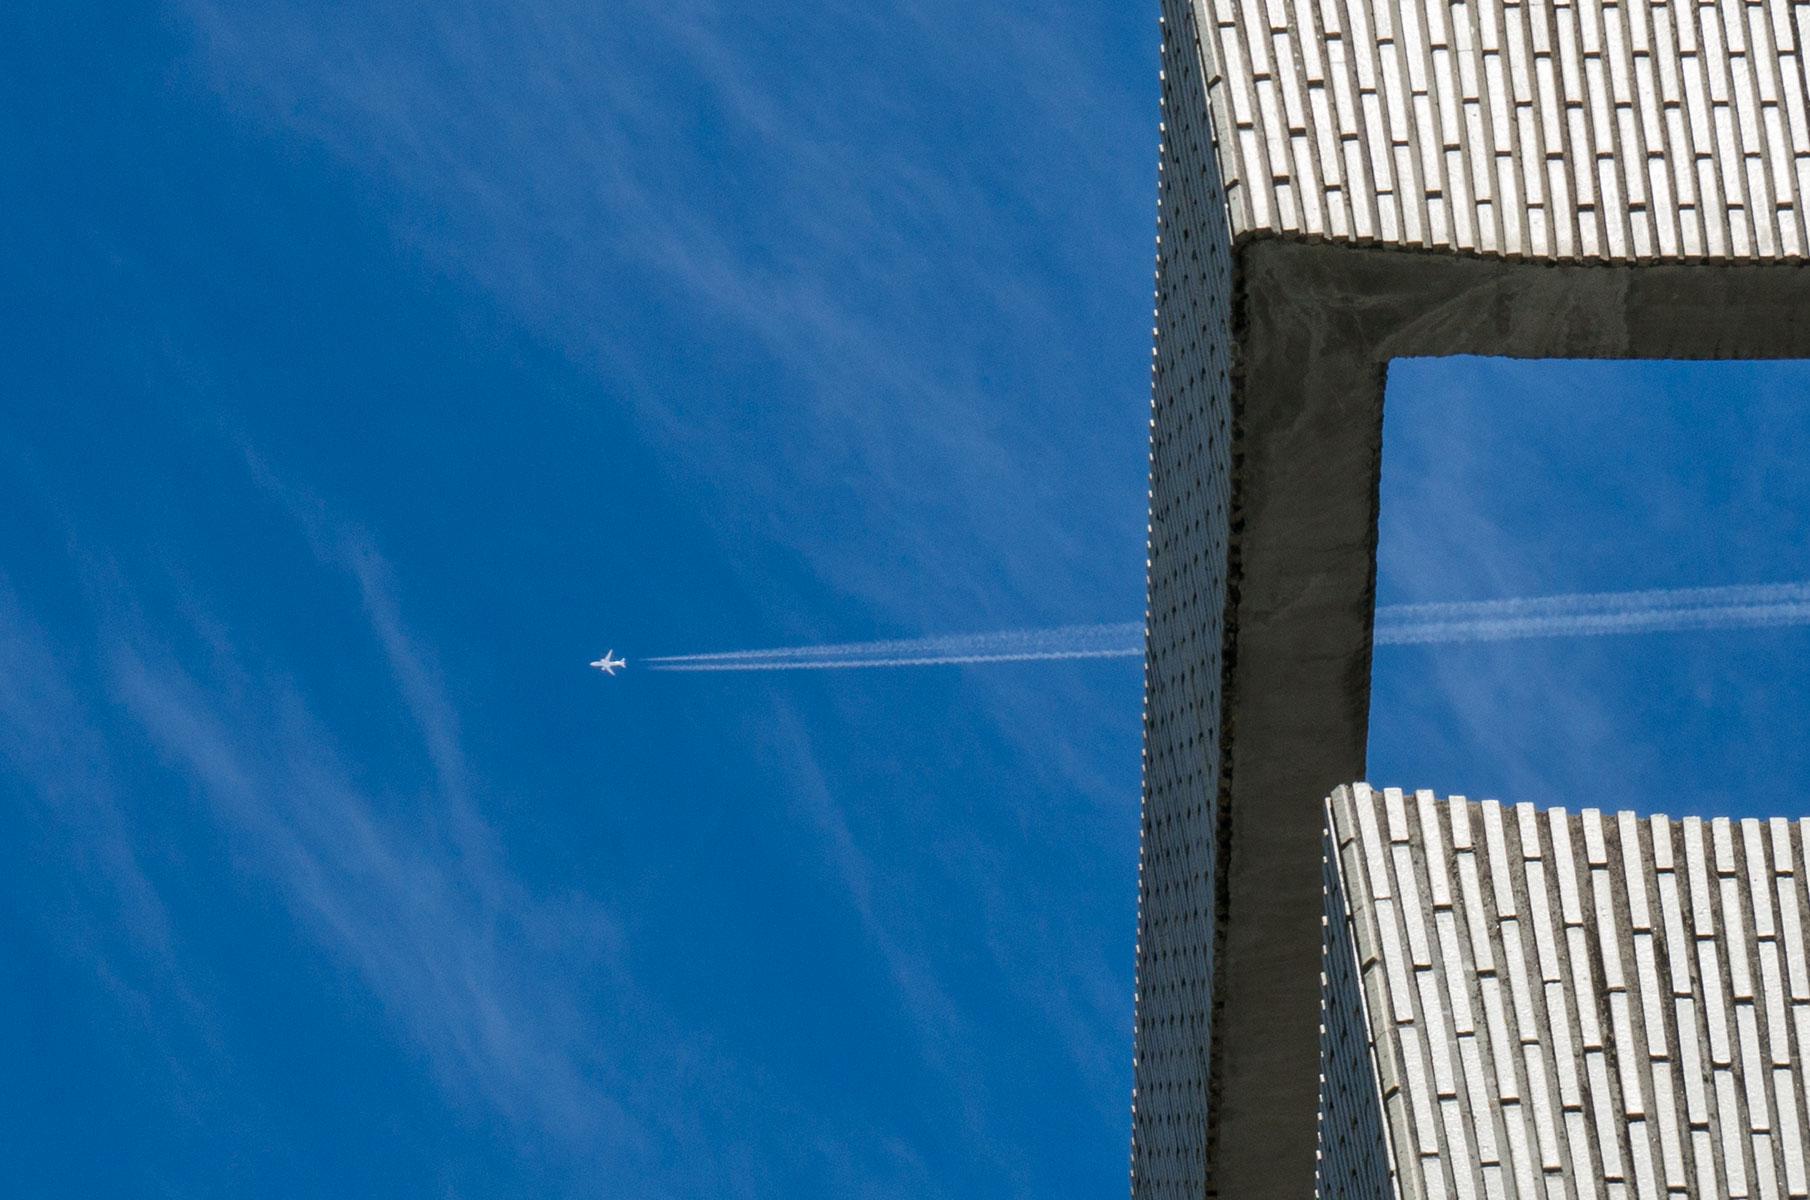 Flugzeug am Himmel von Hiroshima, Japan